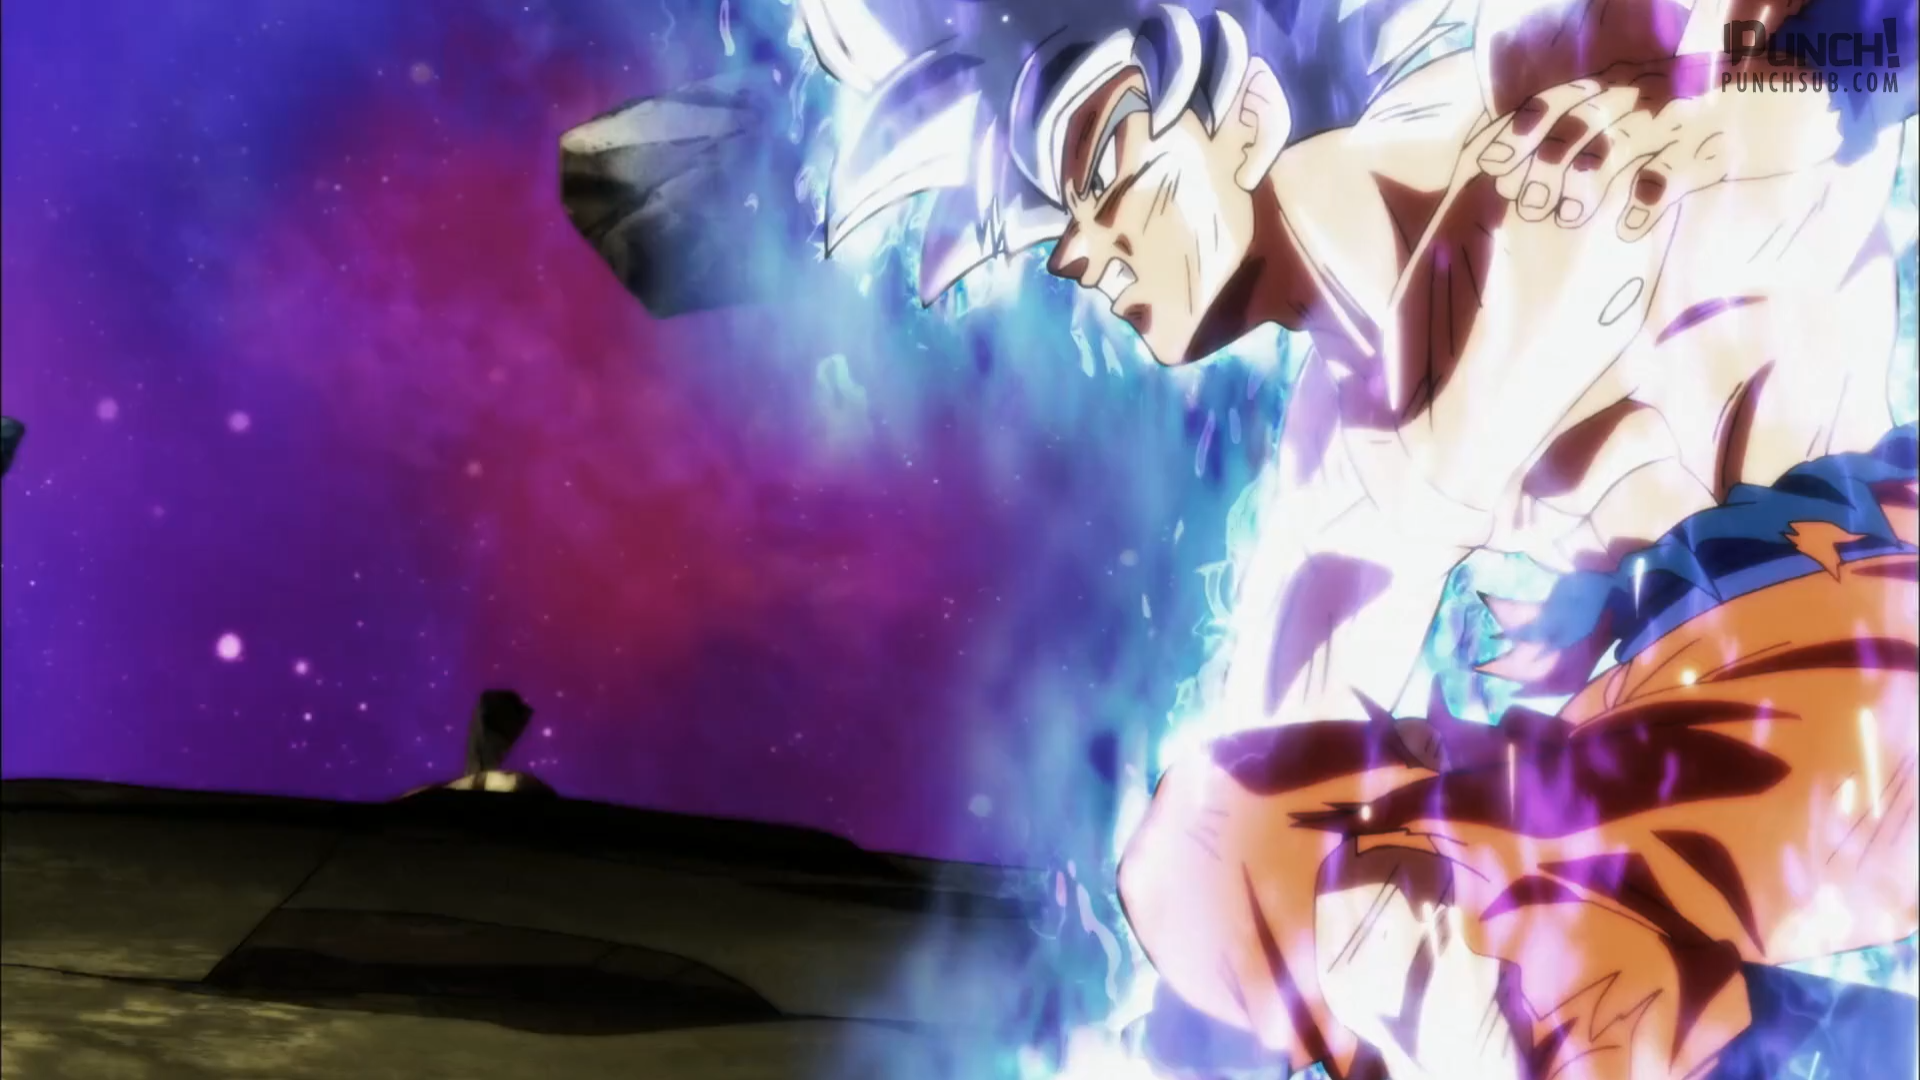 Goku Mastered Ultra Instinct 5 Ps4wallpapers Com